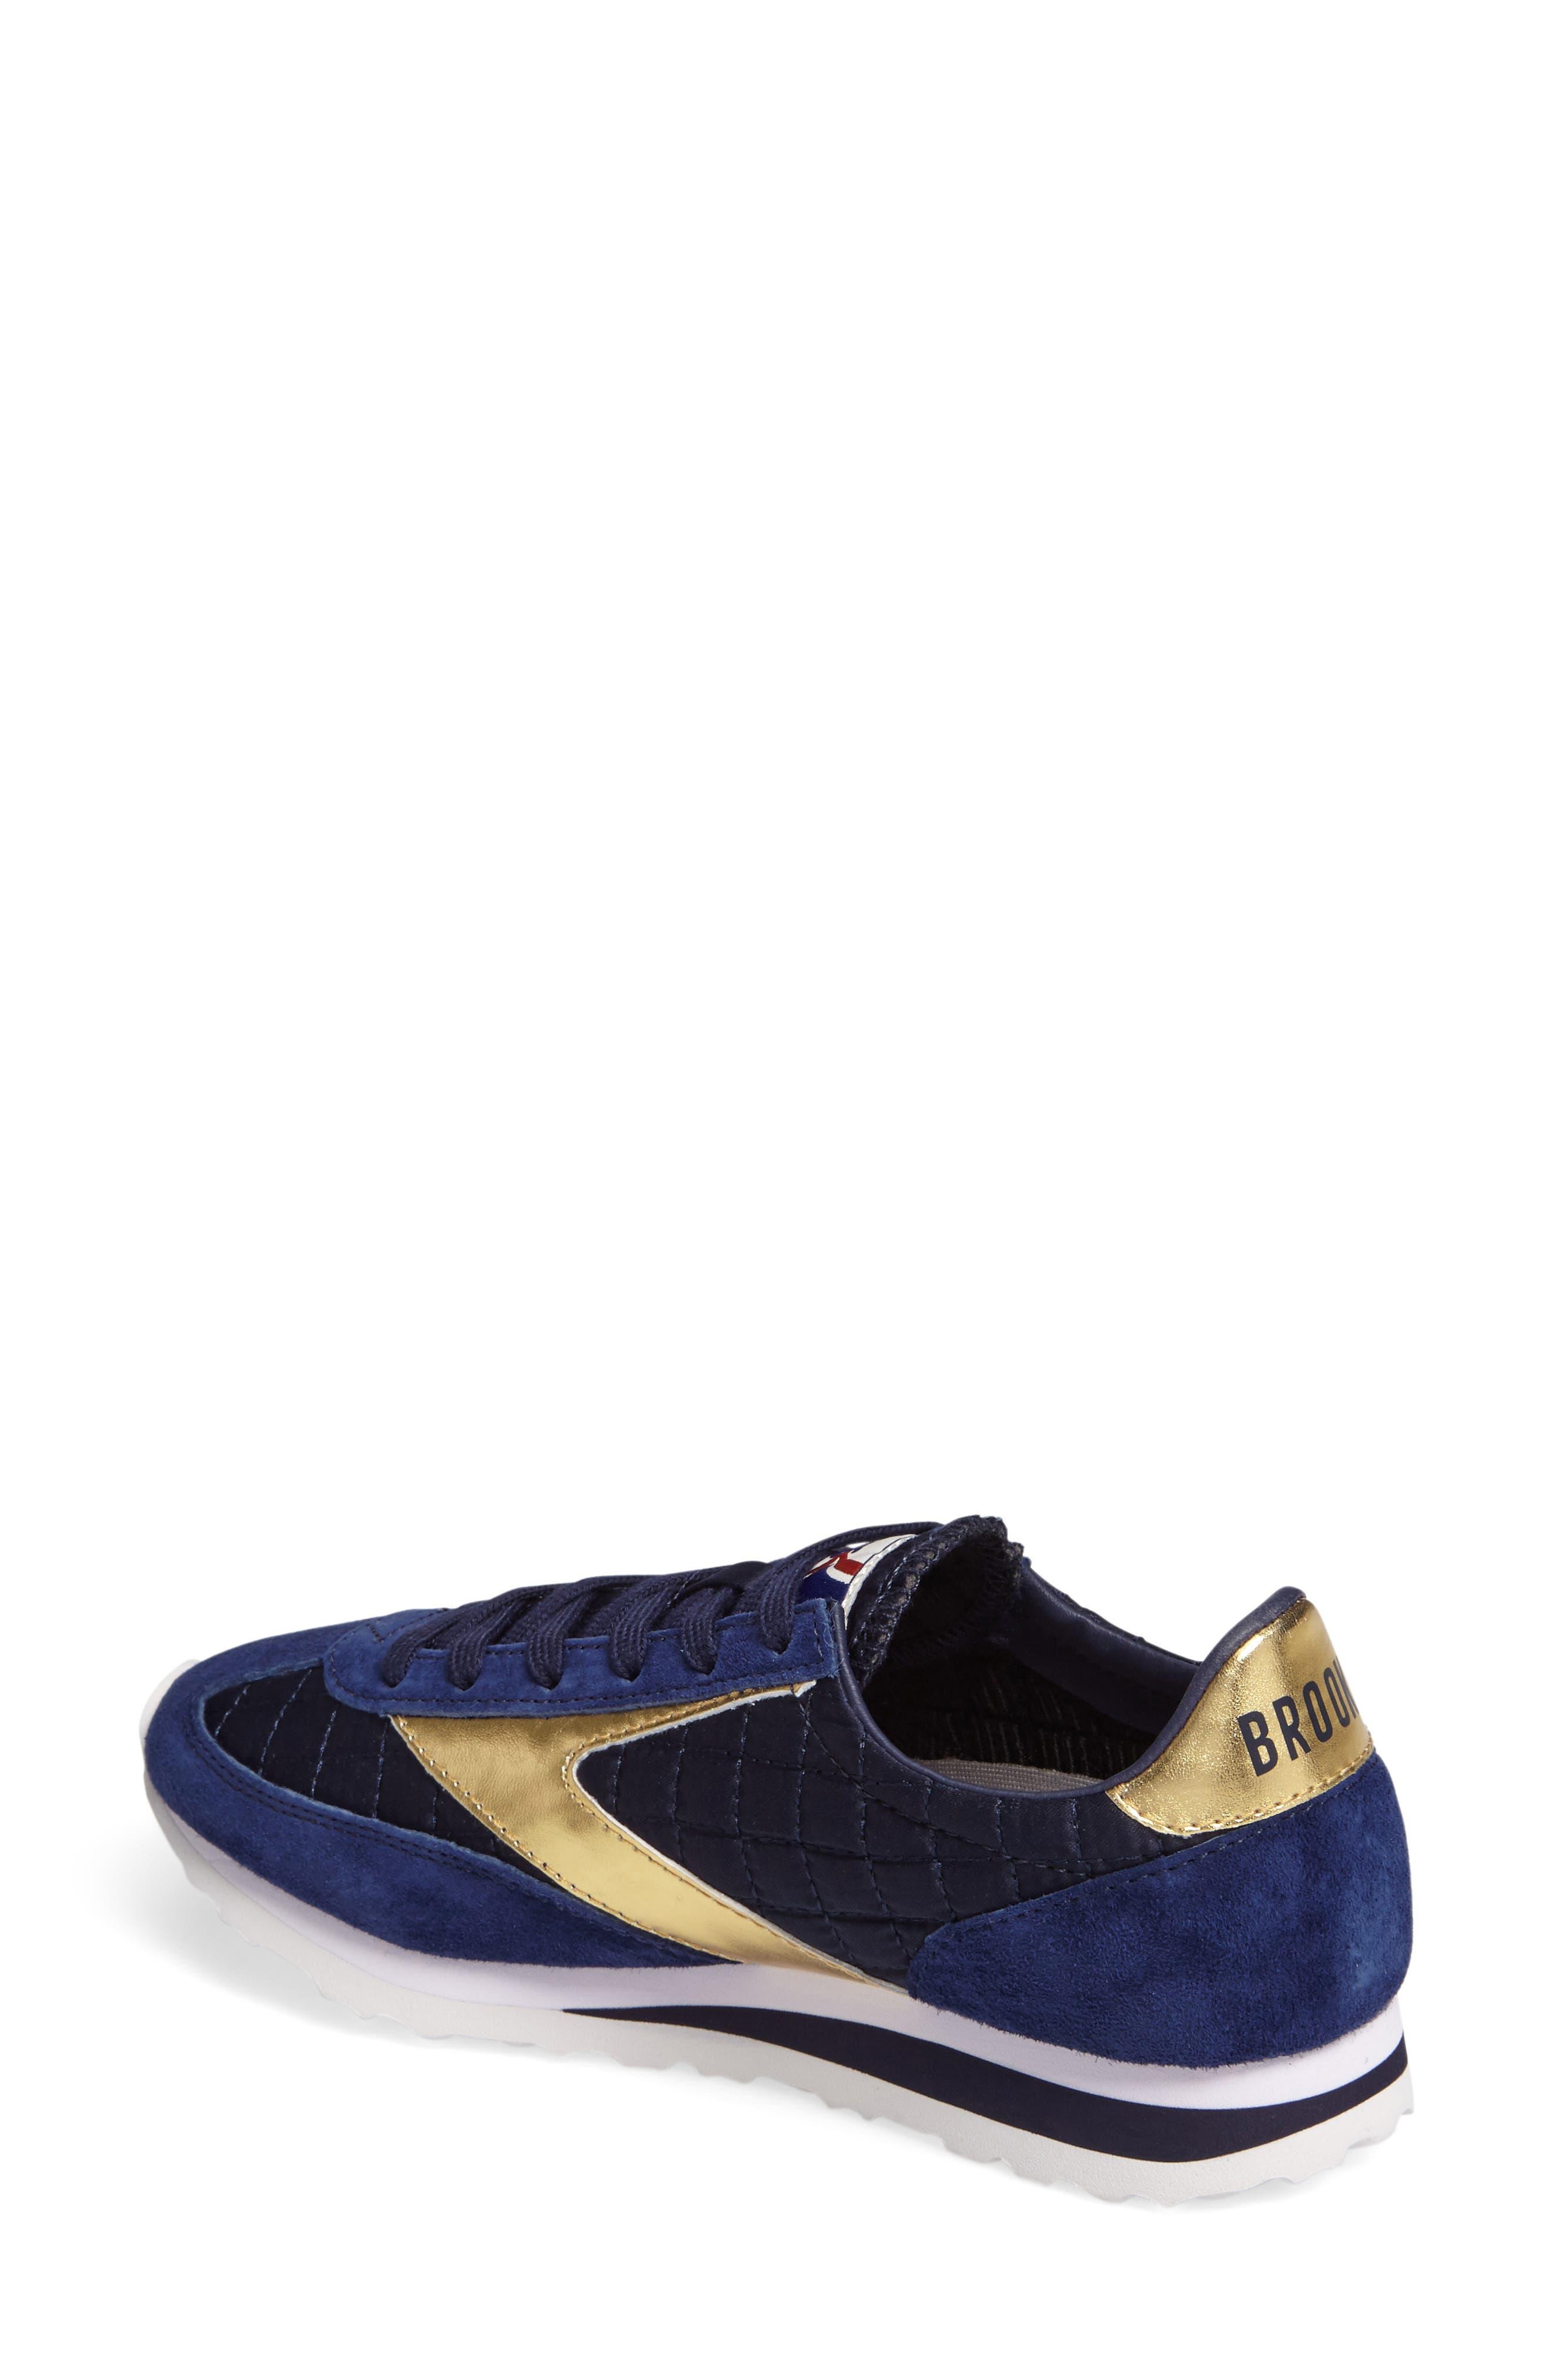 'Vanguard' Sneaker,                             Alternate thumbnail 77, color,